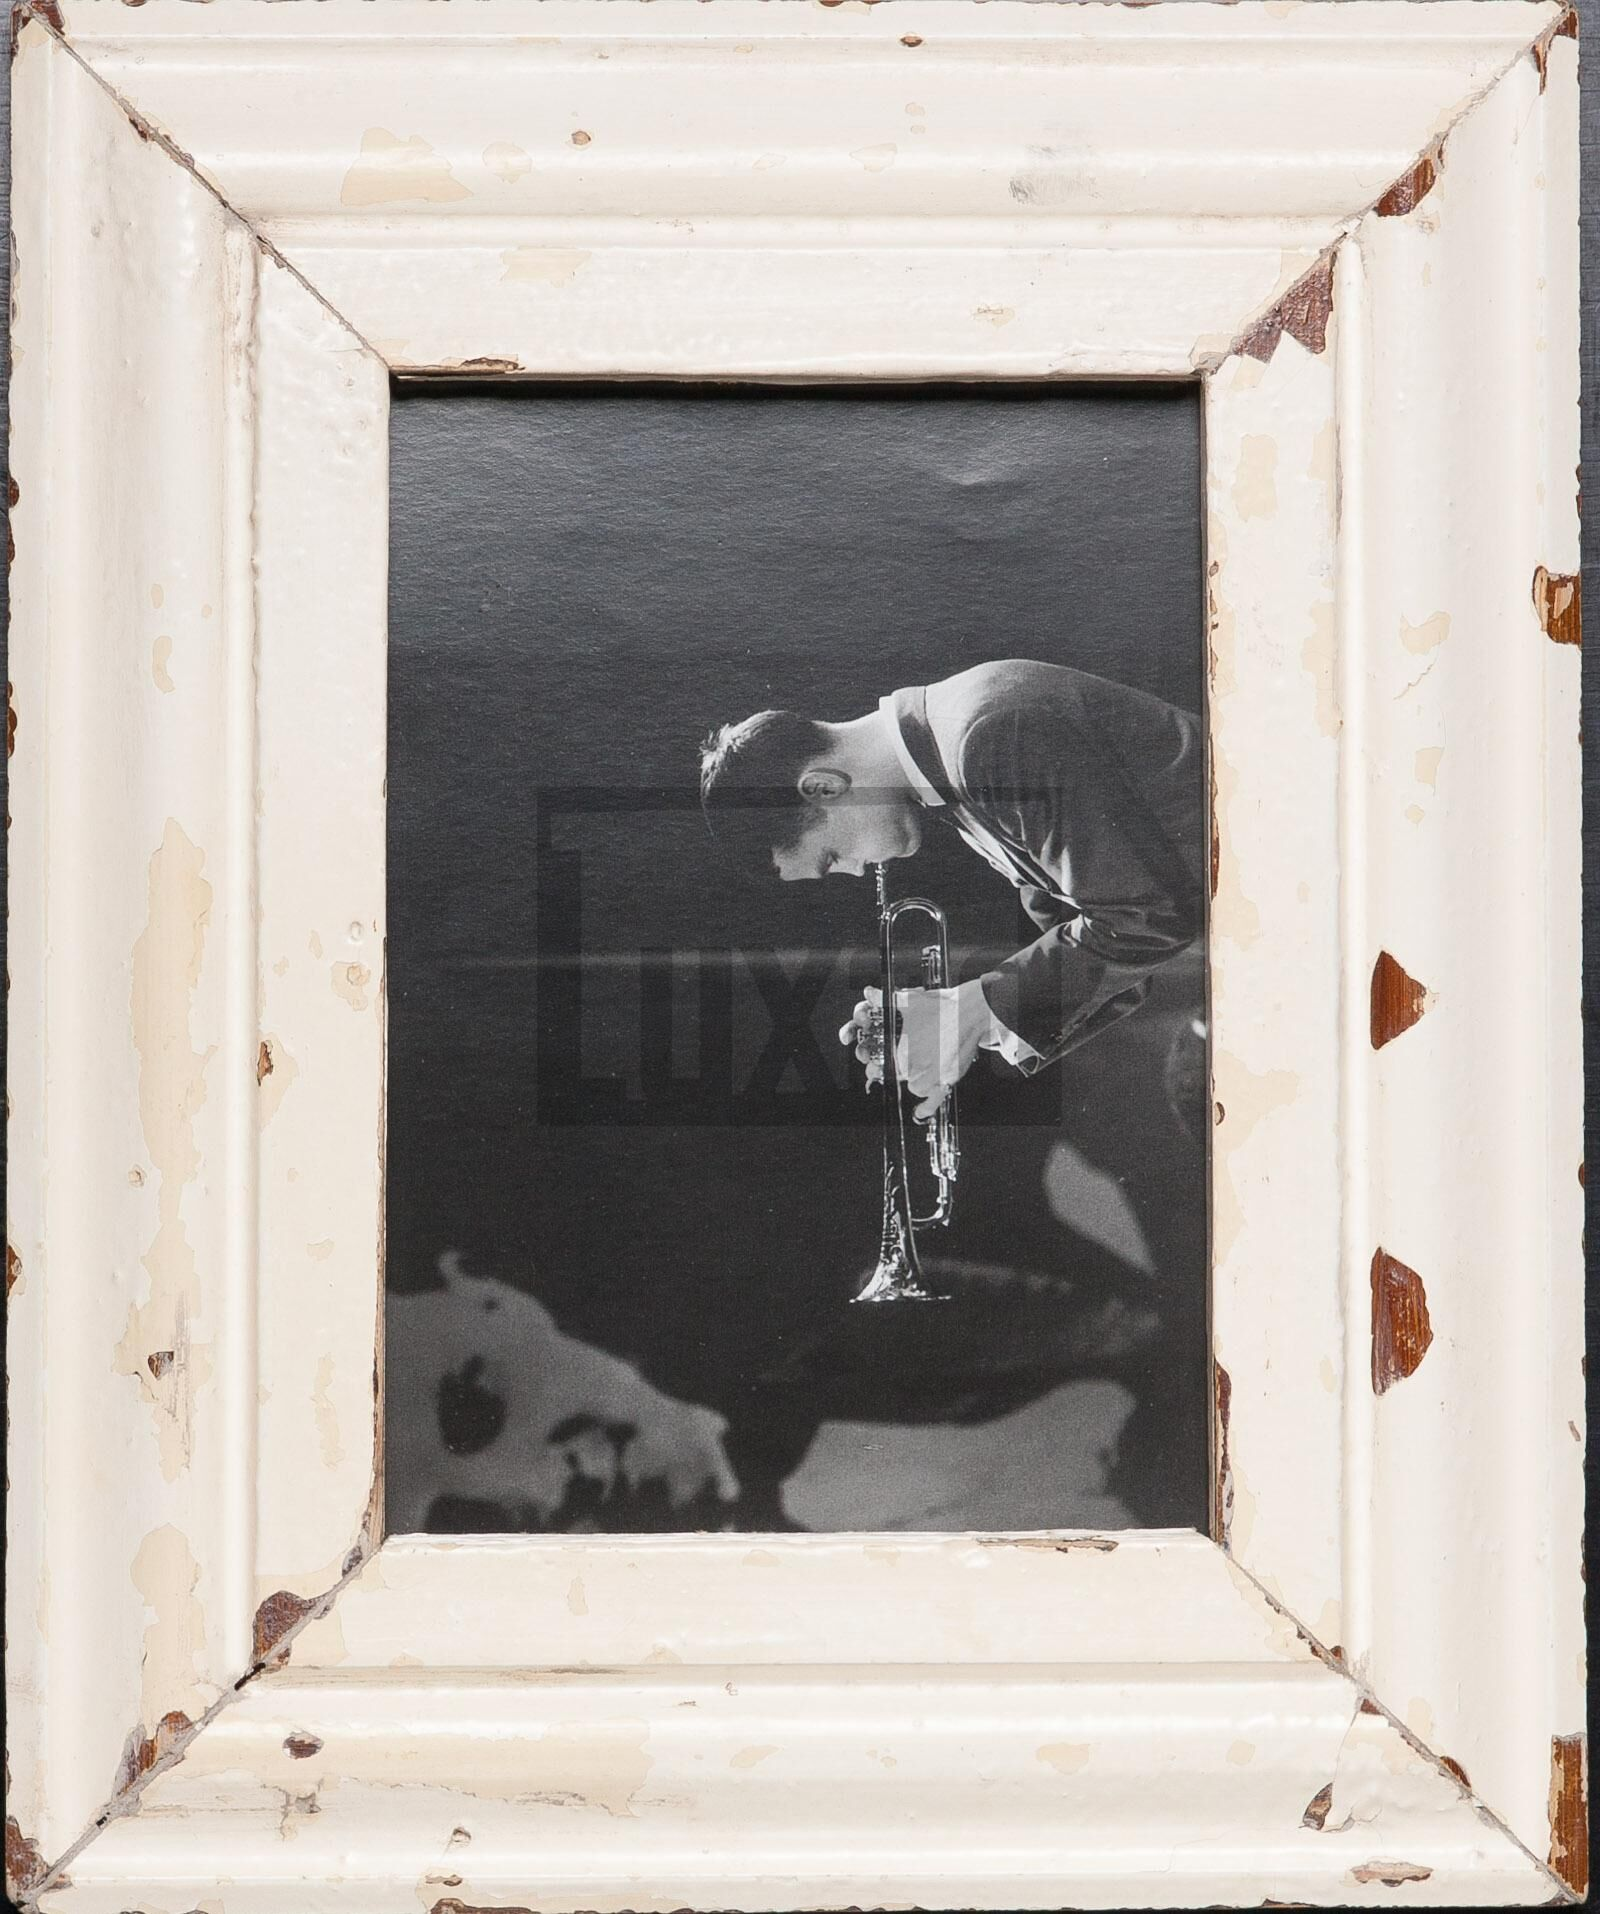 Altholz-Bilderrahmen für ca. 14,8 x 21 cm